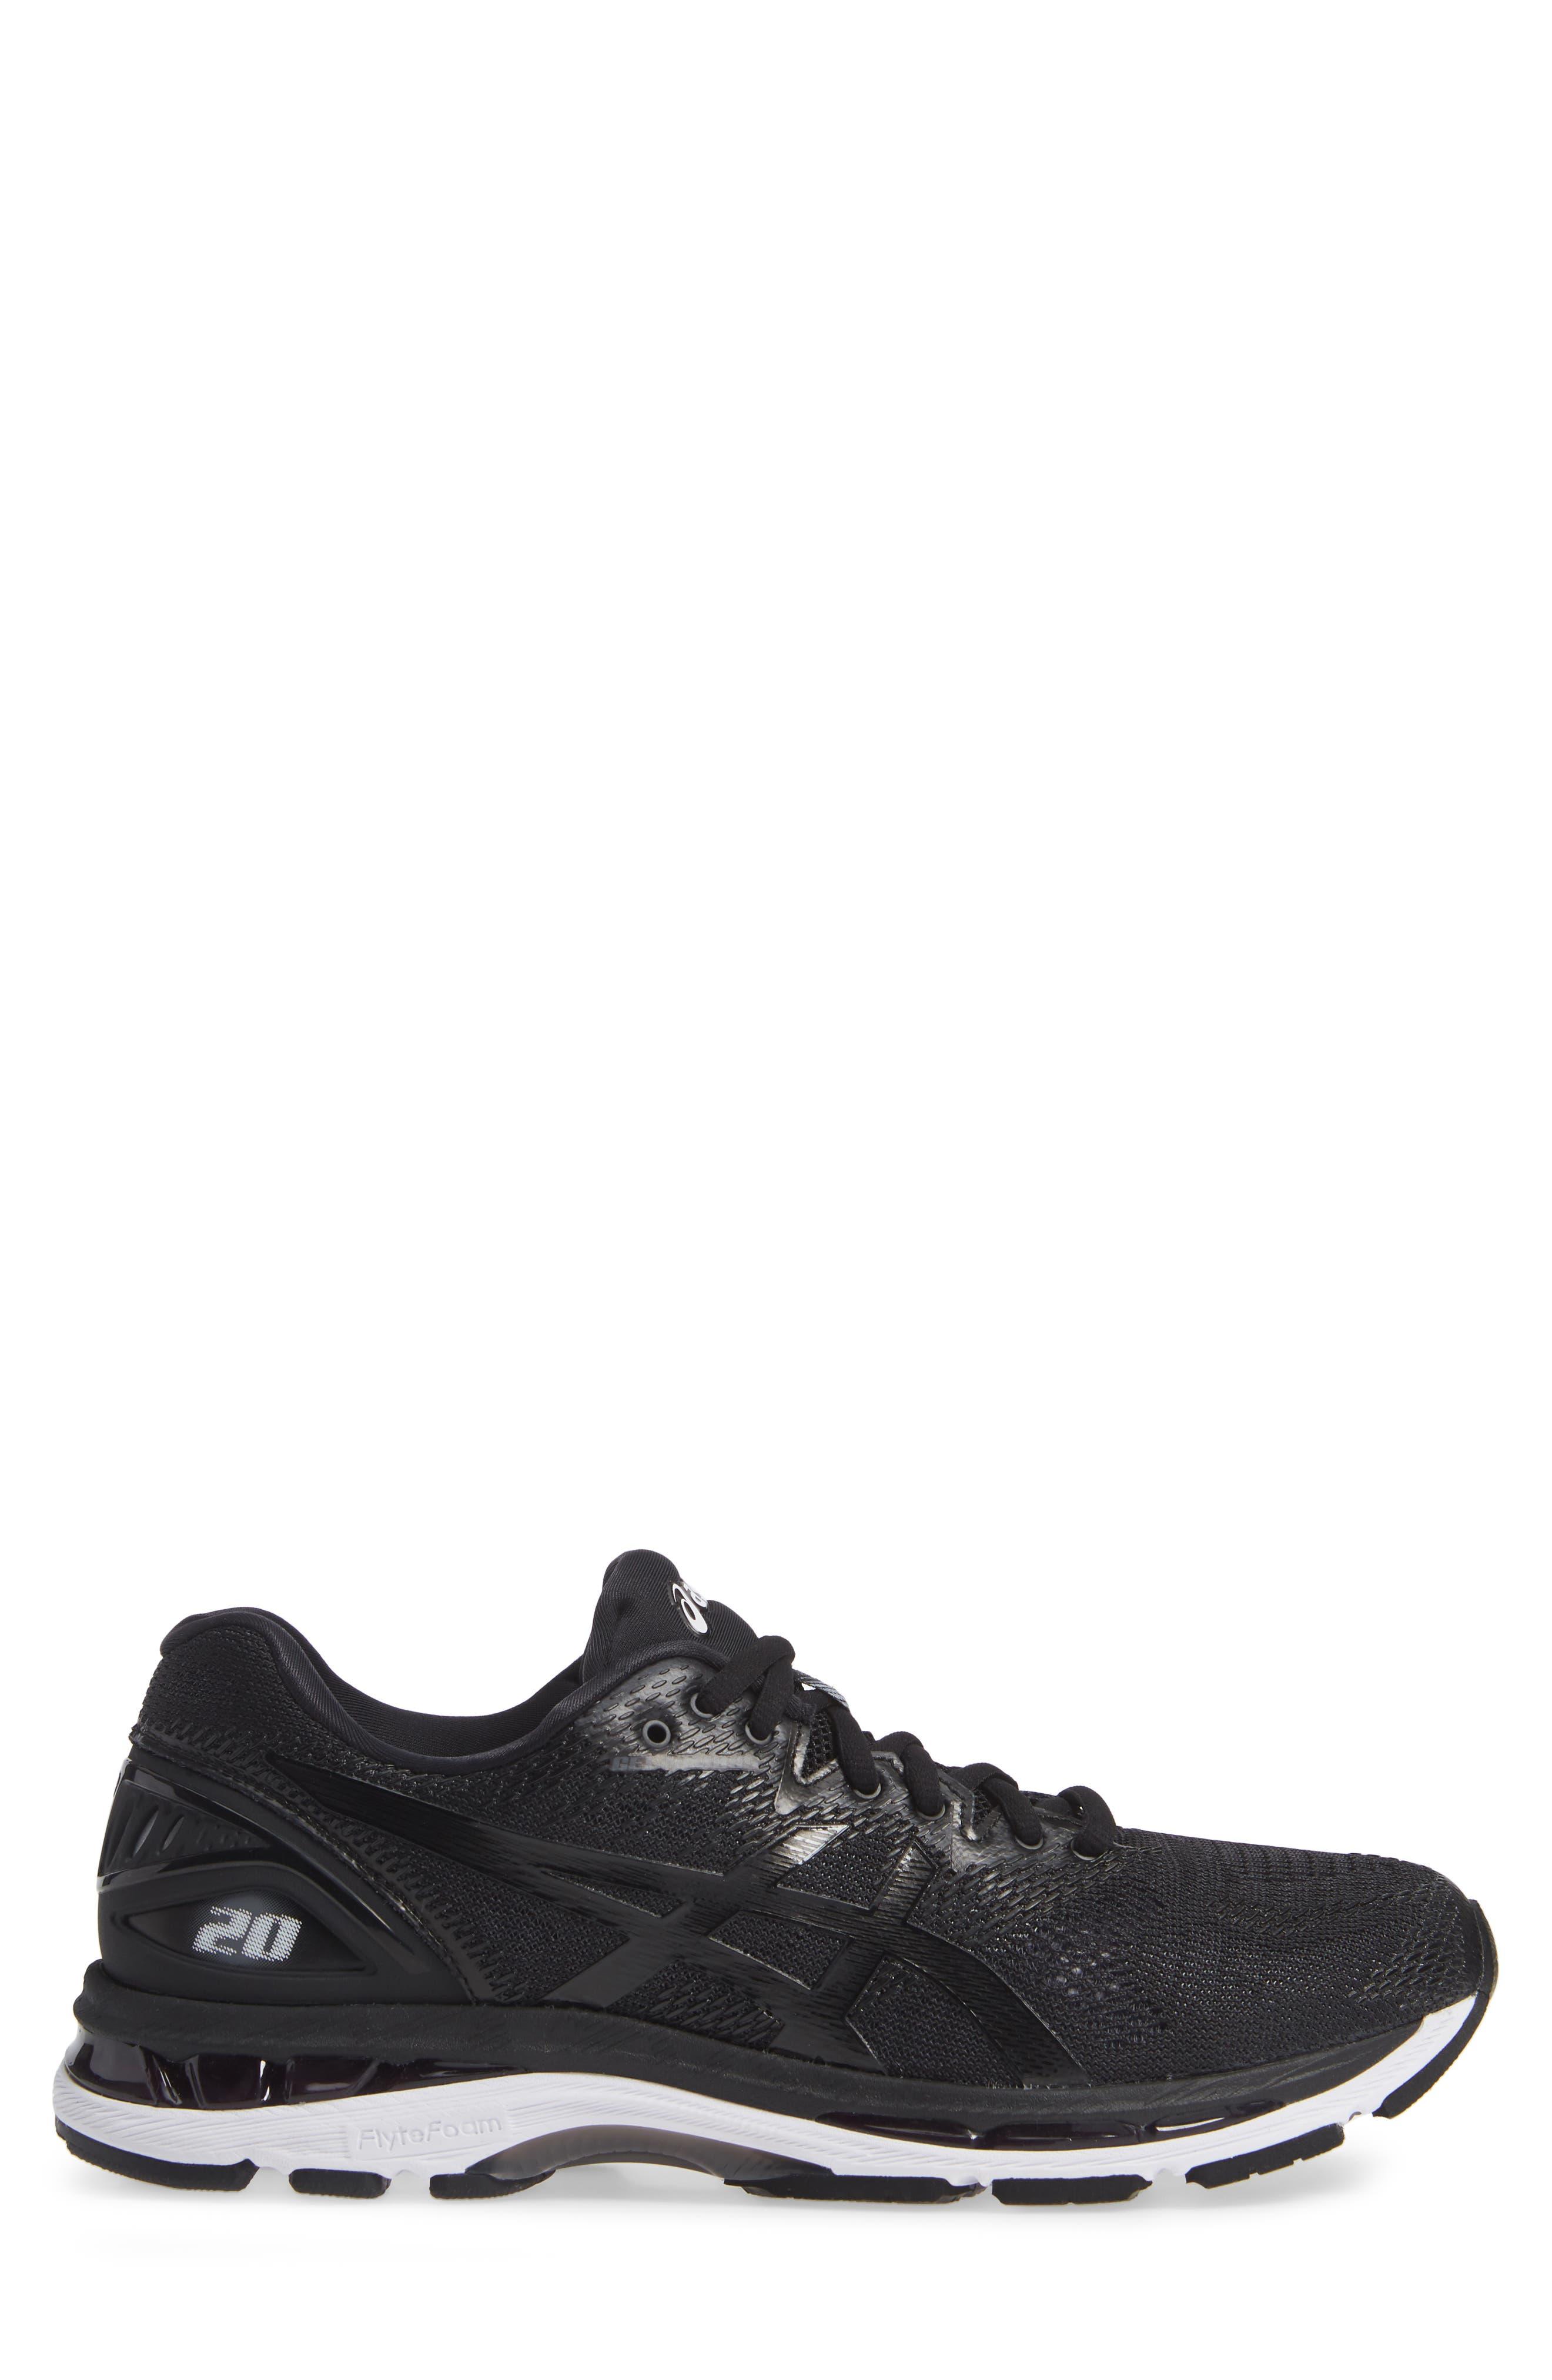 GEL<sup>®</sup>-Nimbus 20 Running Shoe,                             Alternate thumbnail 3, color,                             BLACK/ WHITE/ CARBON